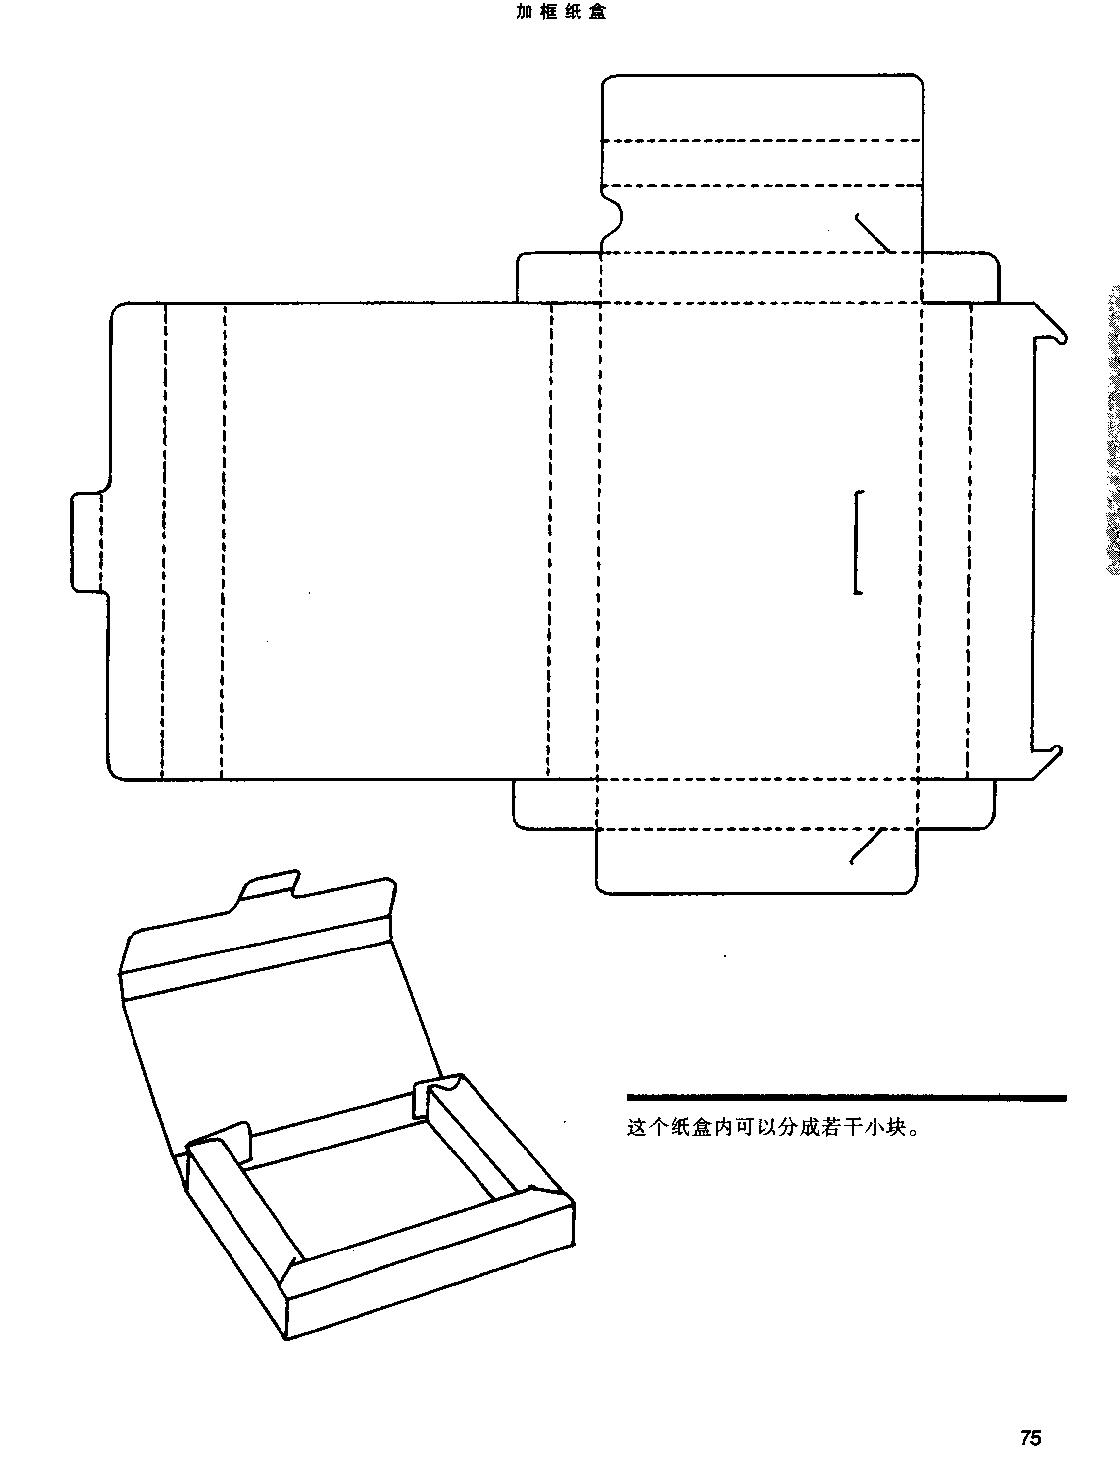 box template | Box, Cards & Origami Templates | Pinterest | Box ...